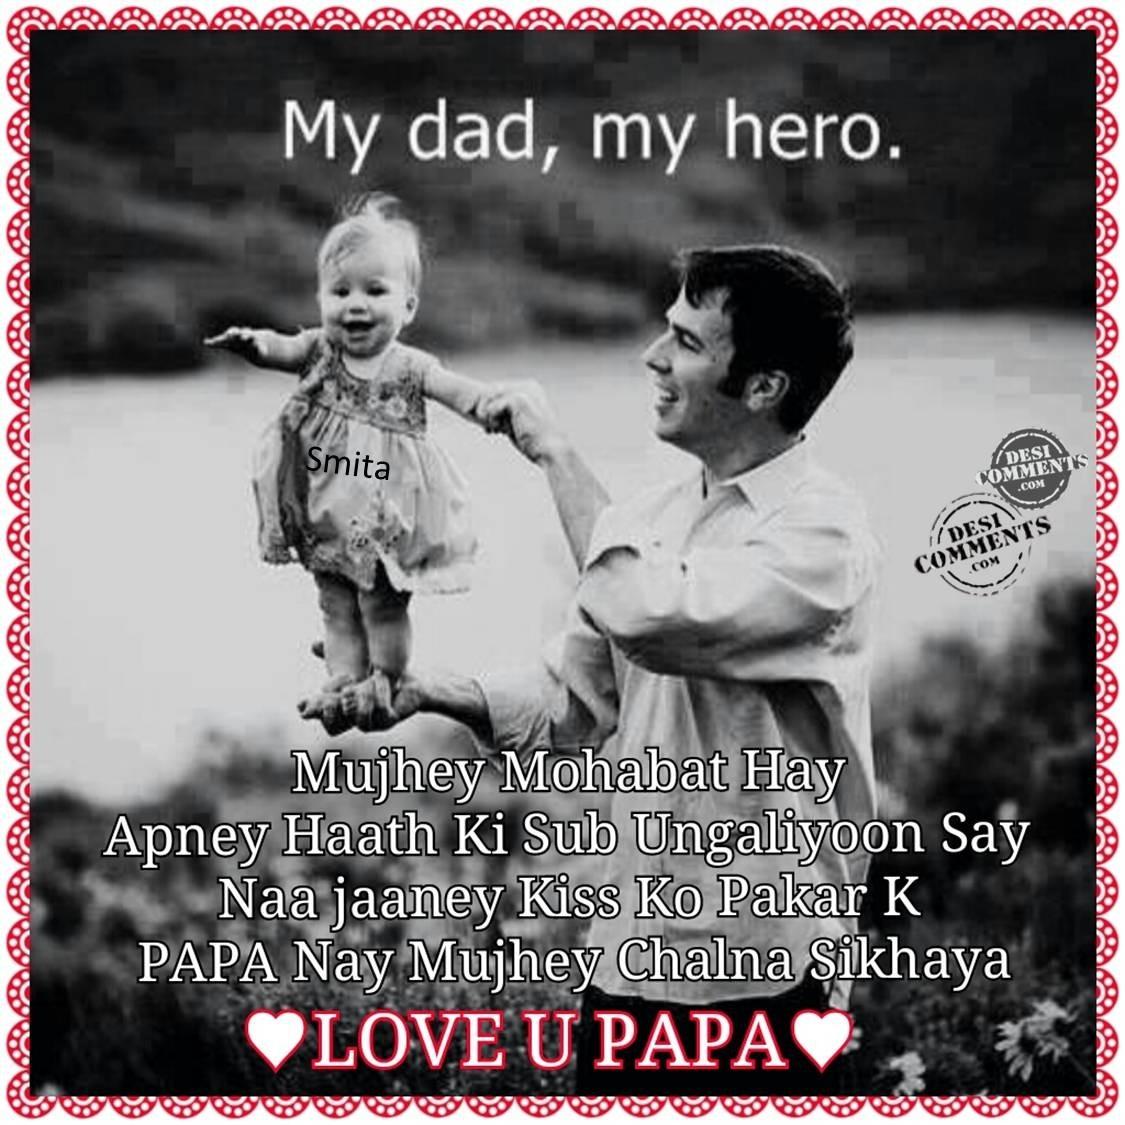 Love U Papa